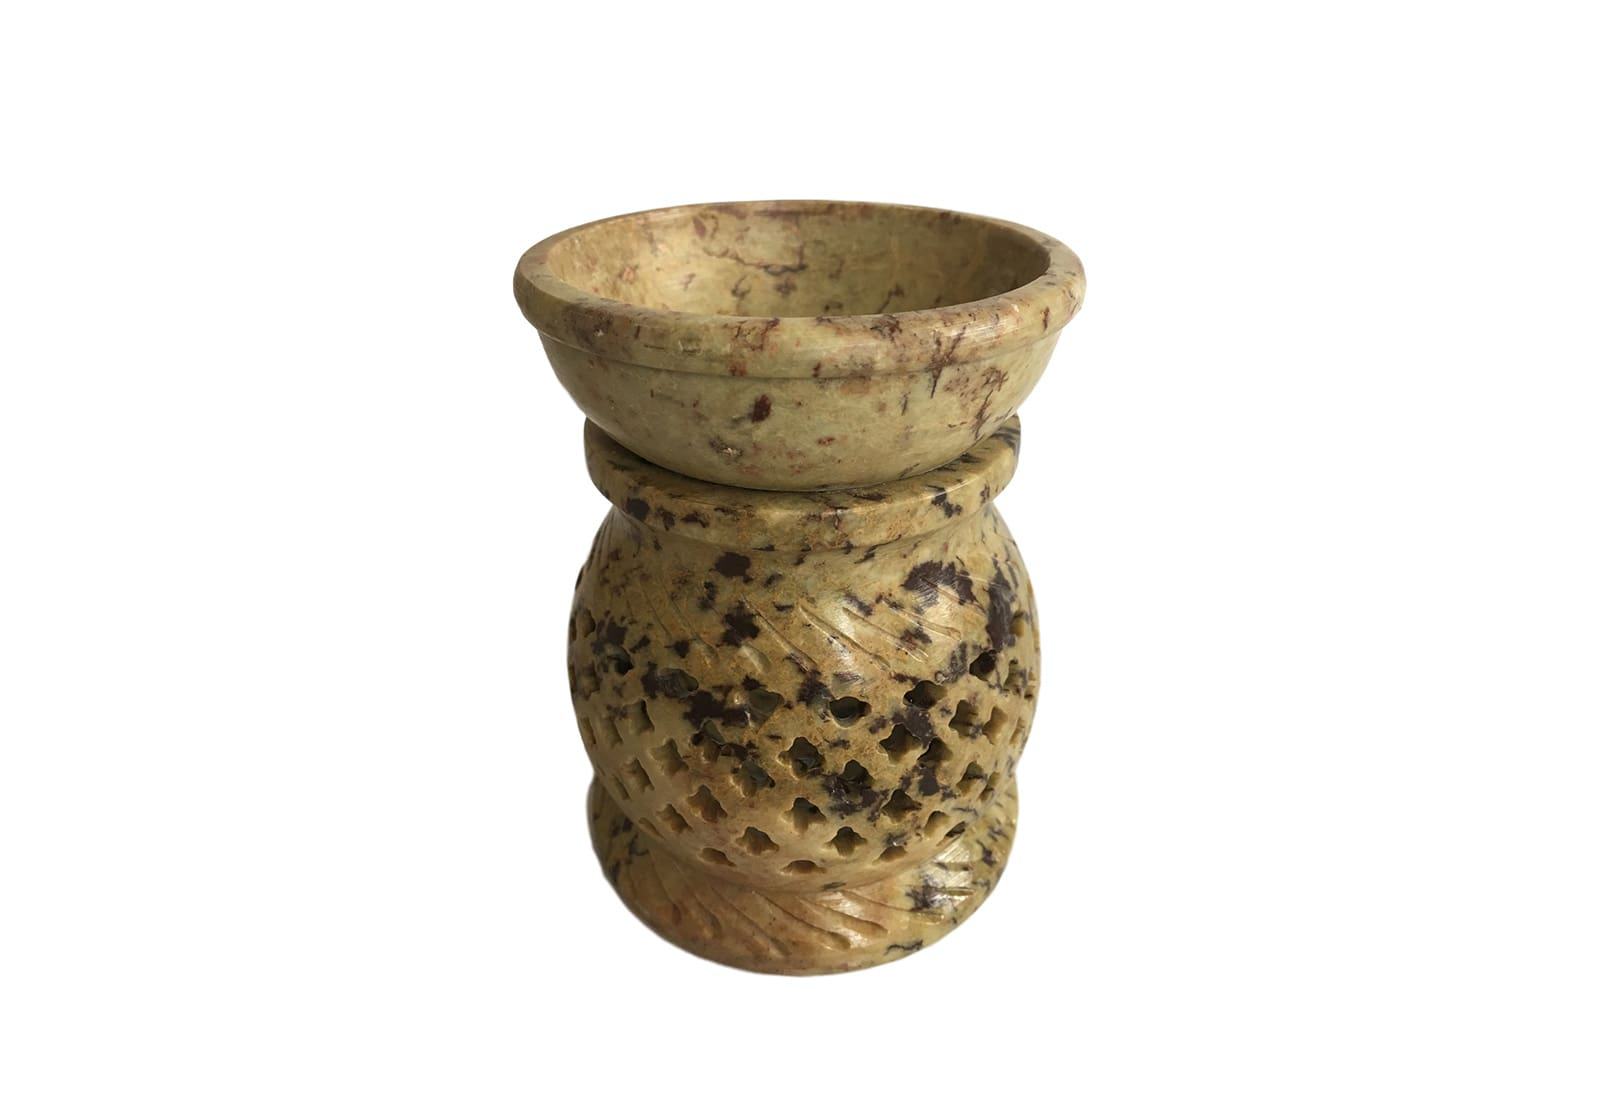 Фото Аромалампа каменная круглая 10*7,5*7,5 см Индия (арт.501-12)